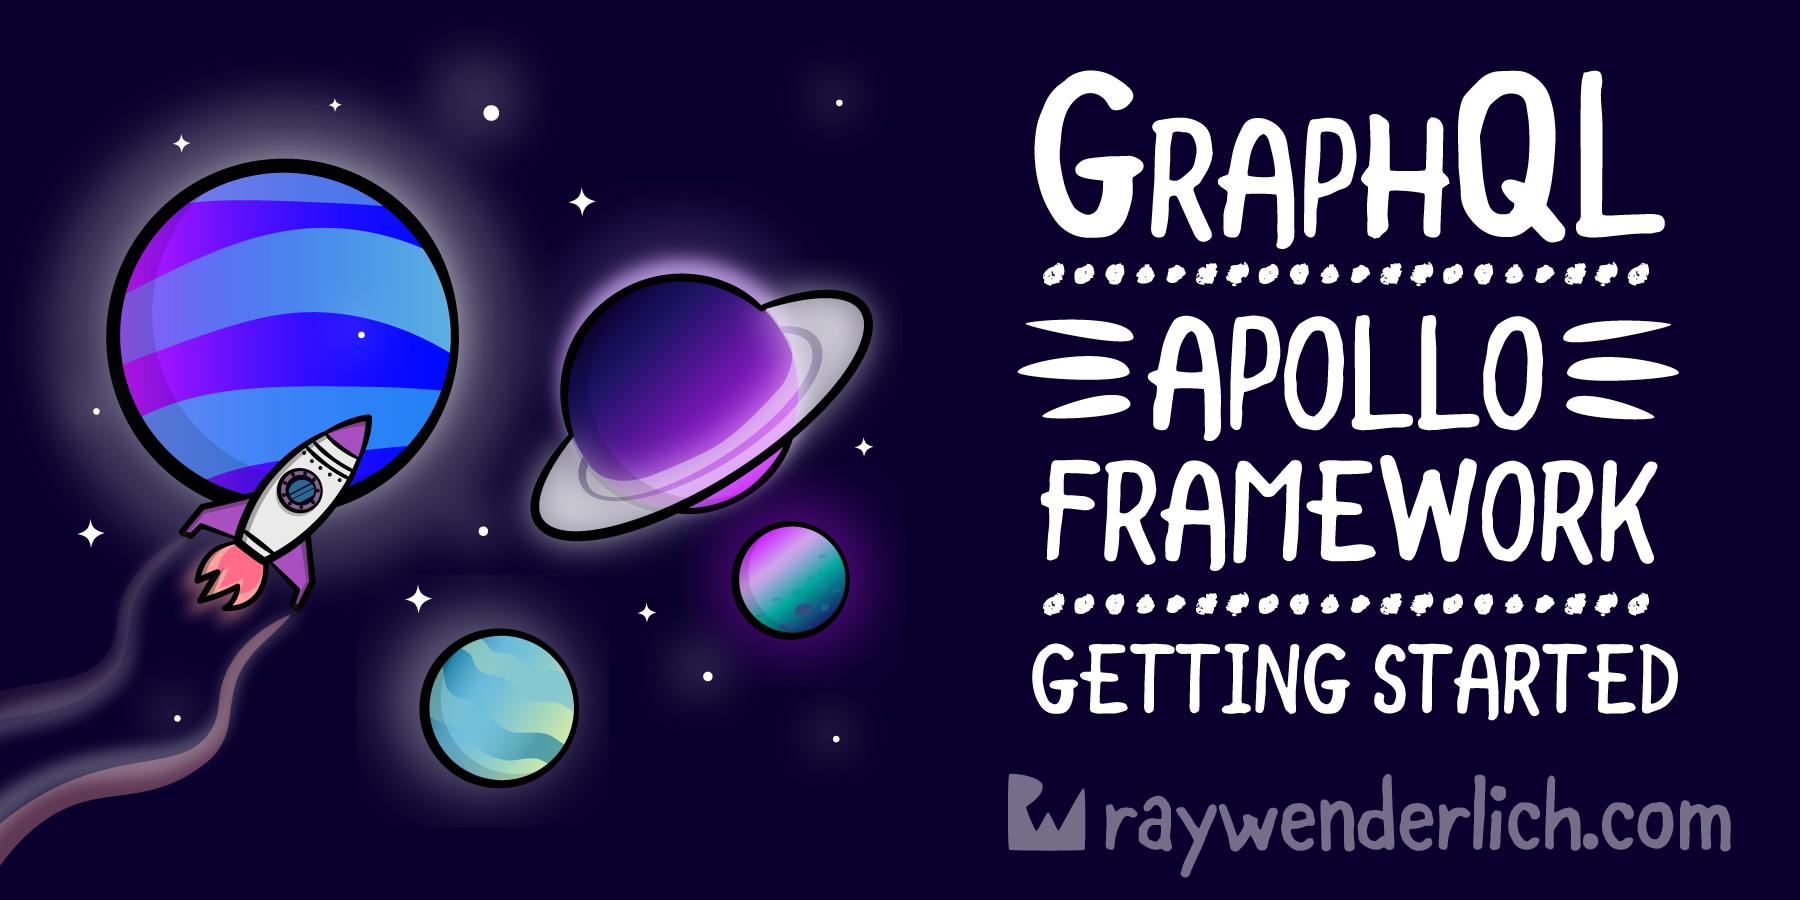 GraphQL Using the Apollo Framework: Getting Started [FREE]